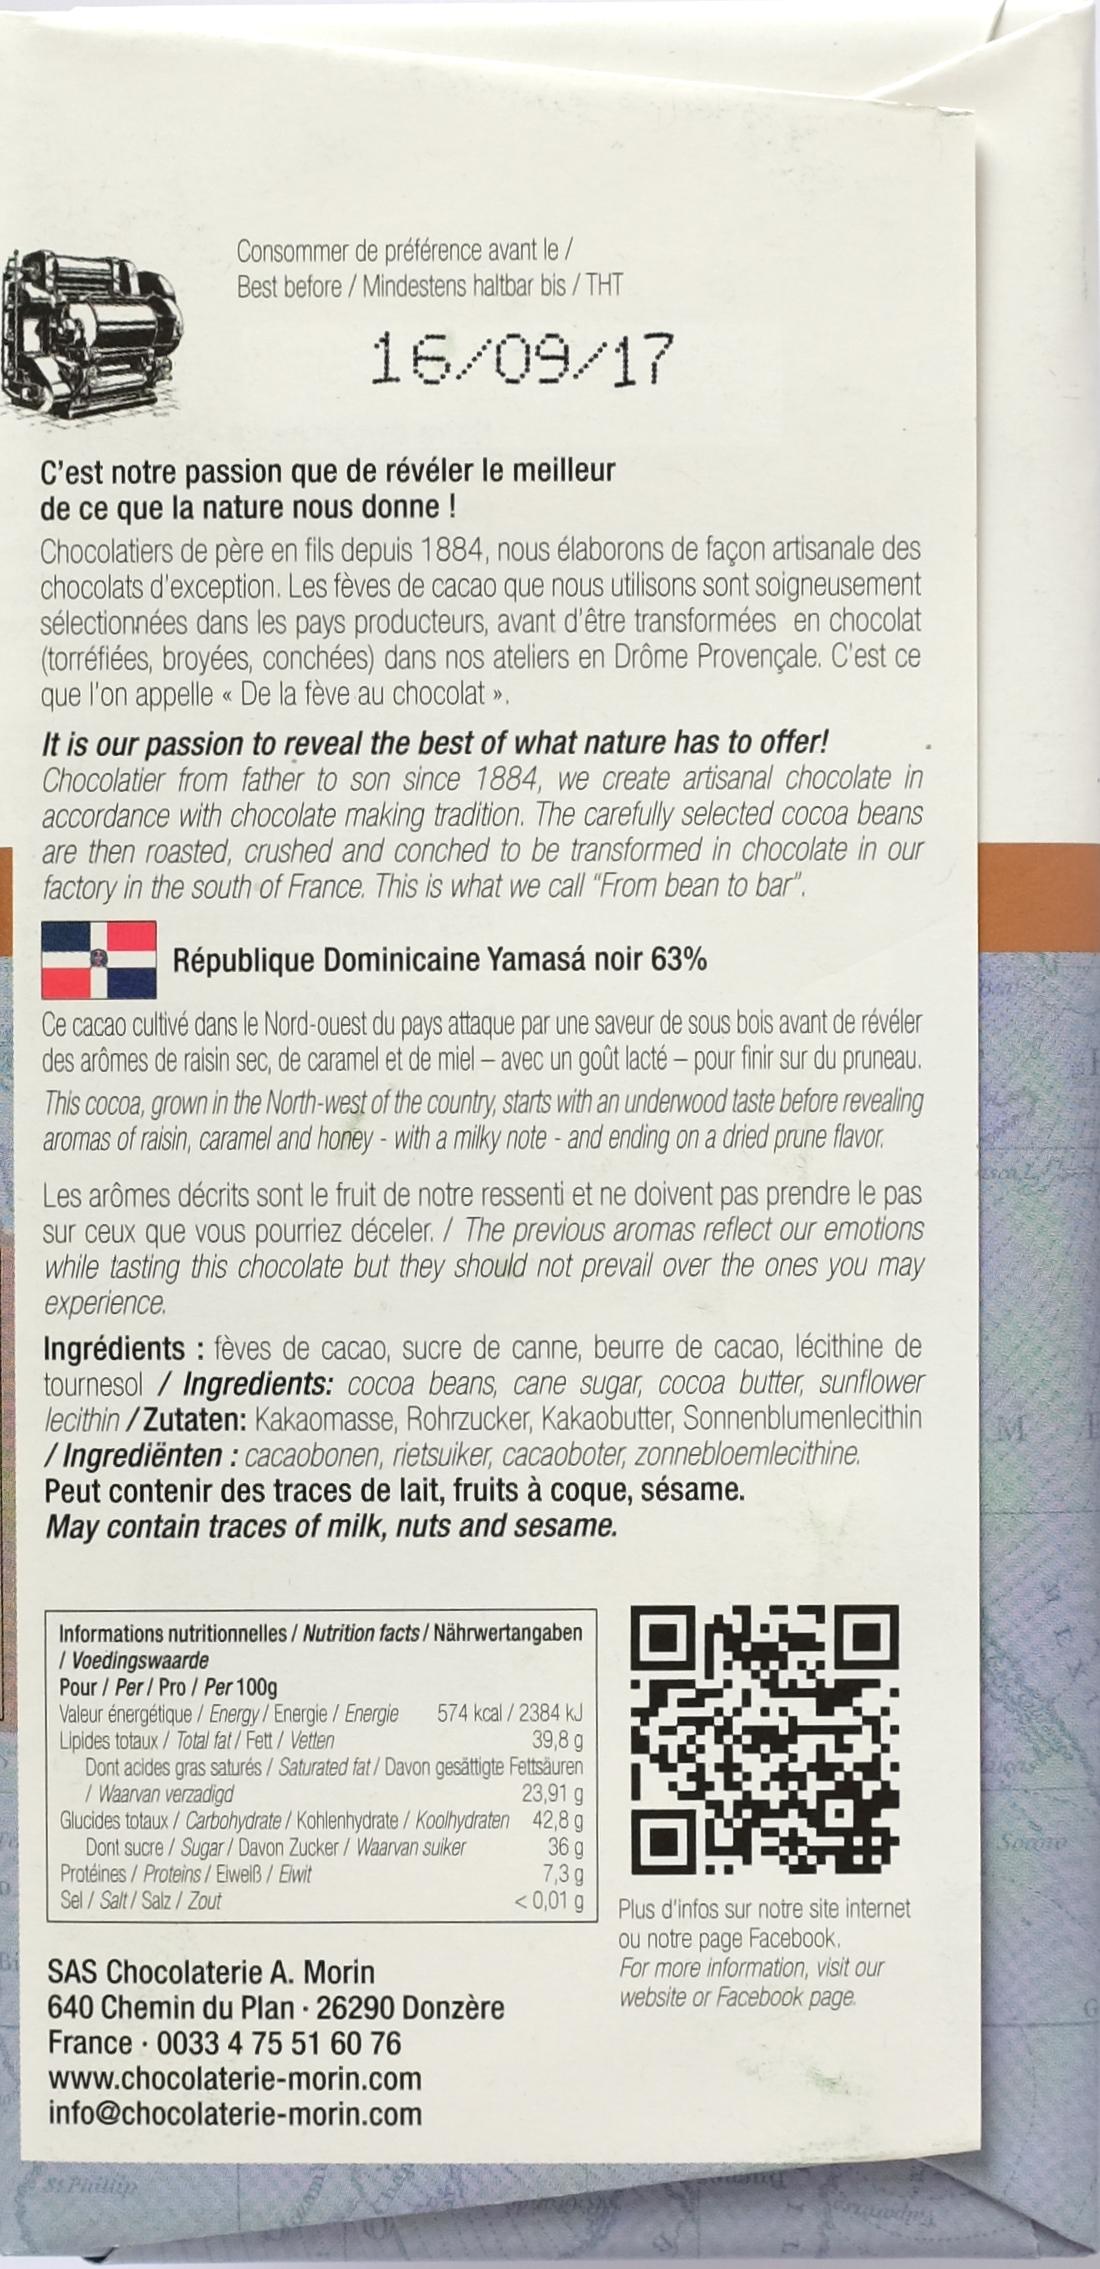 Chocolaterie A. Morin, 63% Dominikanische Republik, Rückseite